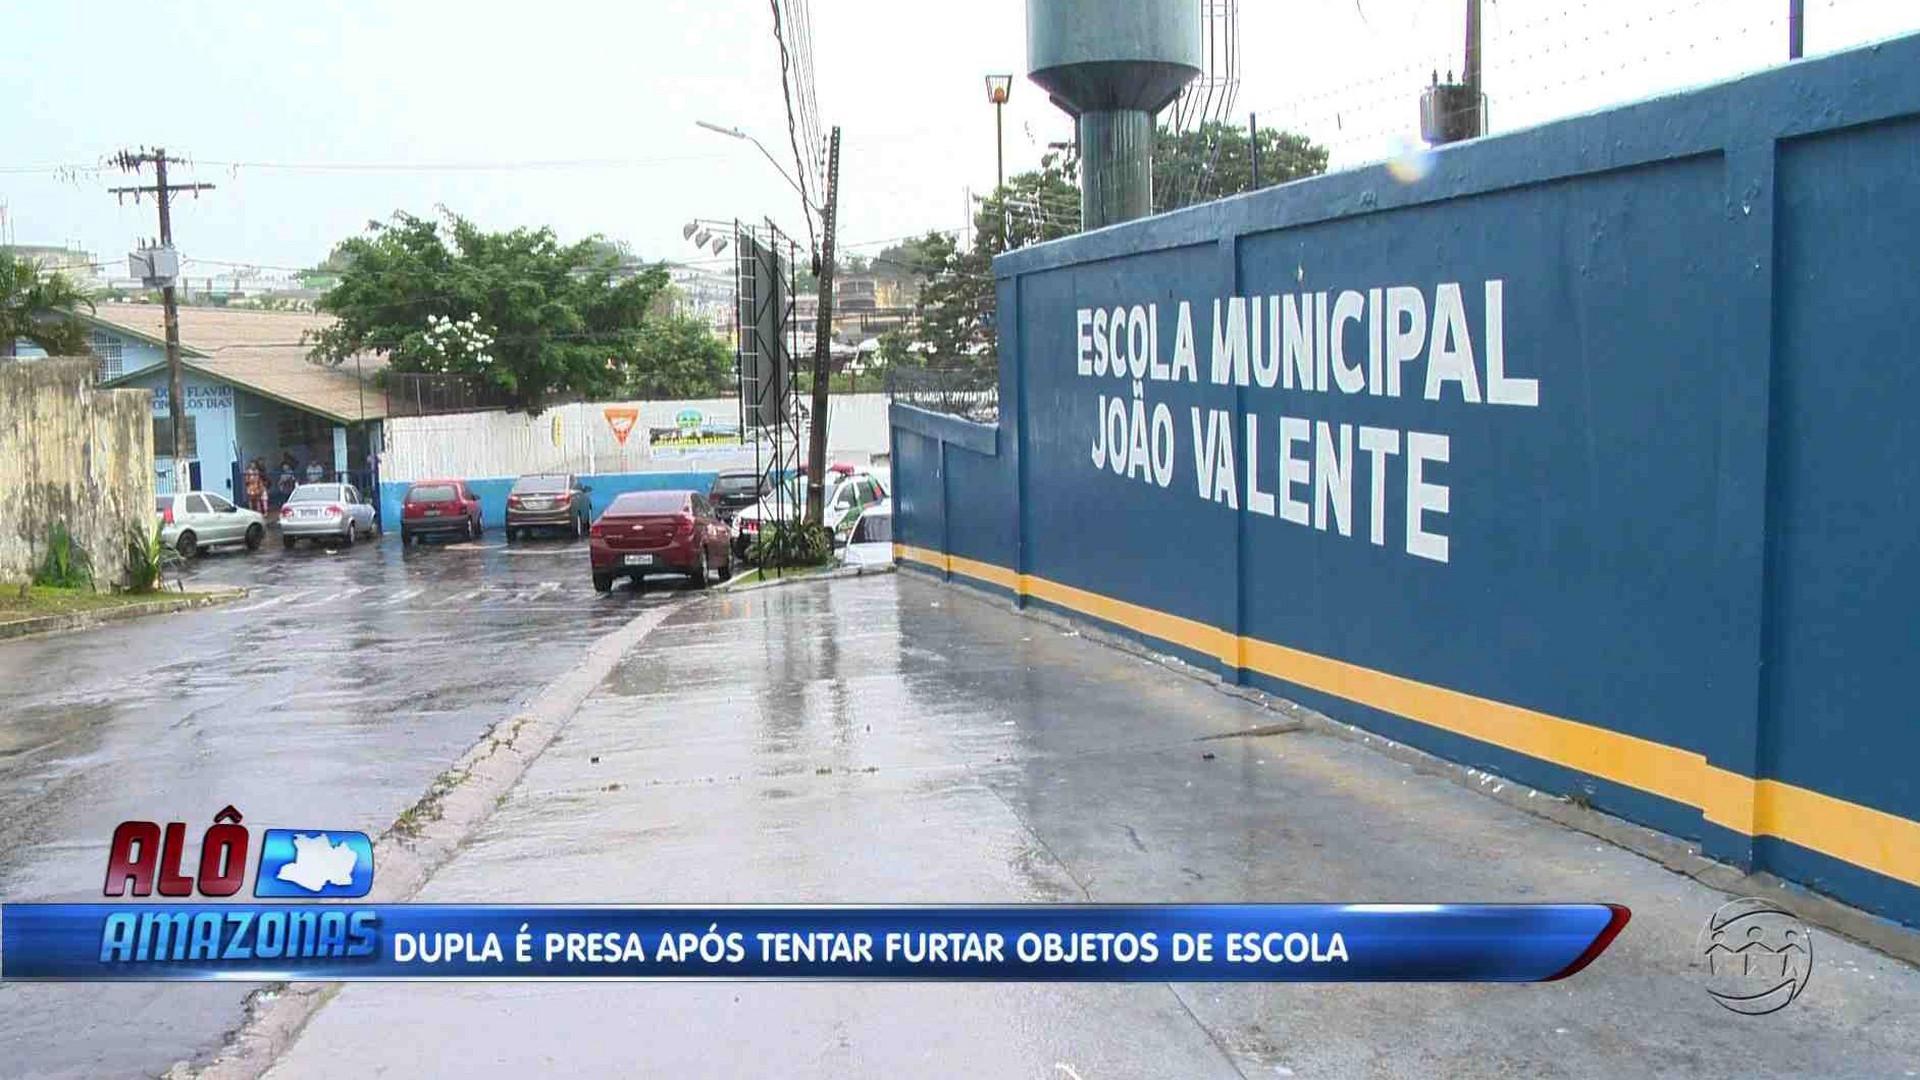 DUPLA É PRESA APÓS TENTAR FURTAR ESCOLA MUNICIPAL - Alô Amazonas 11/12/17